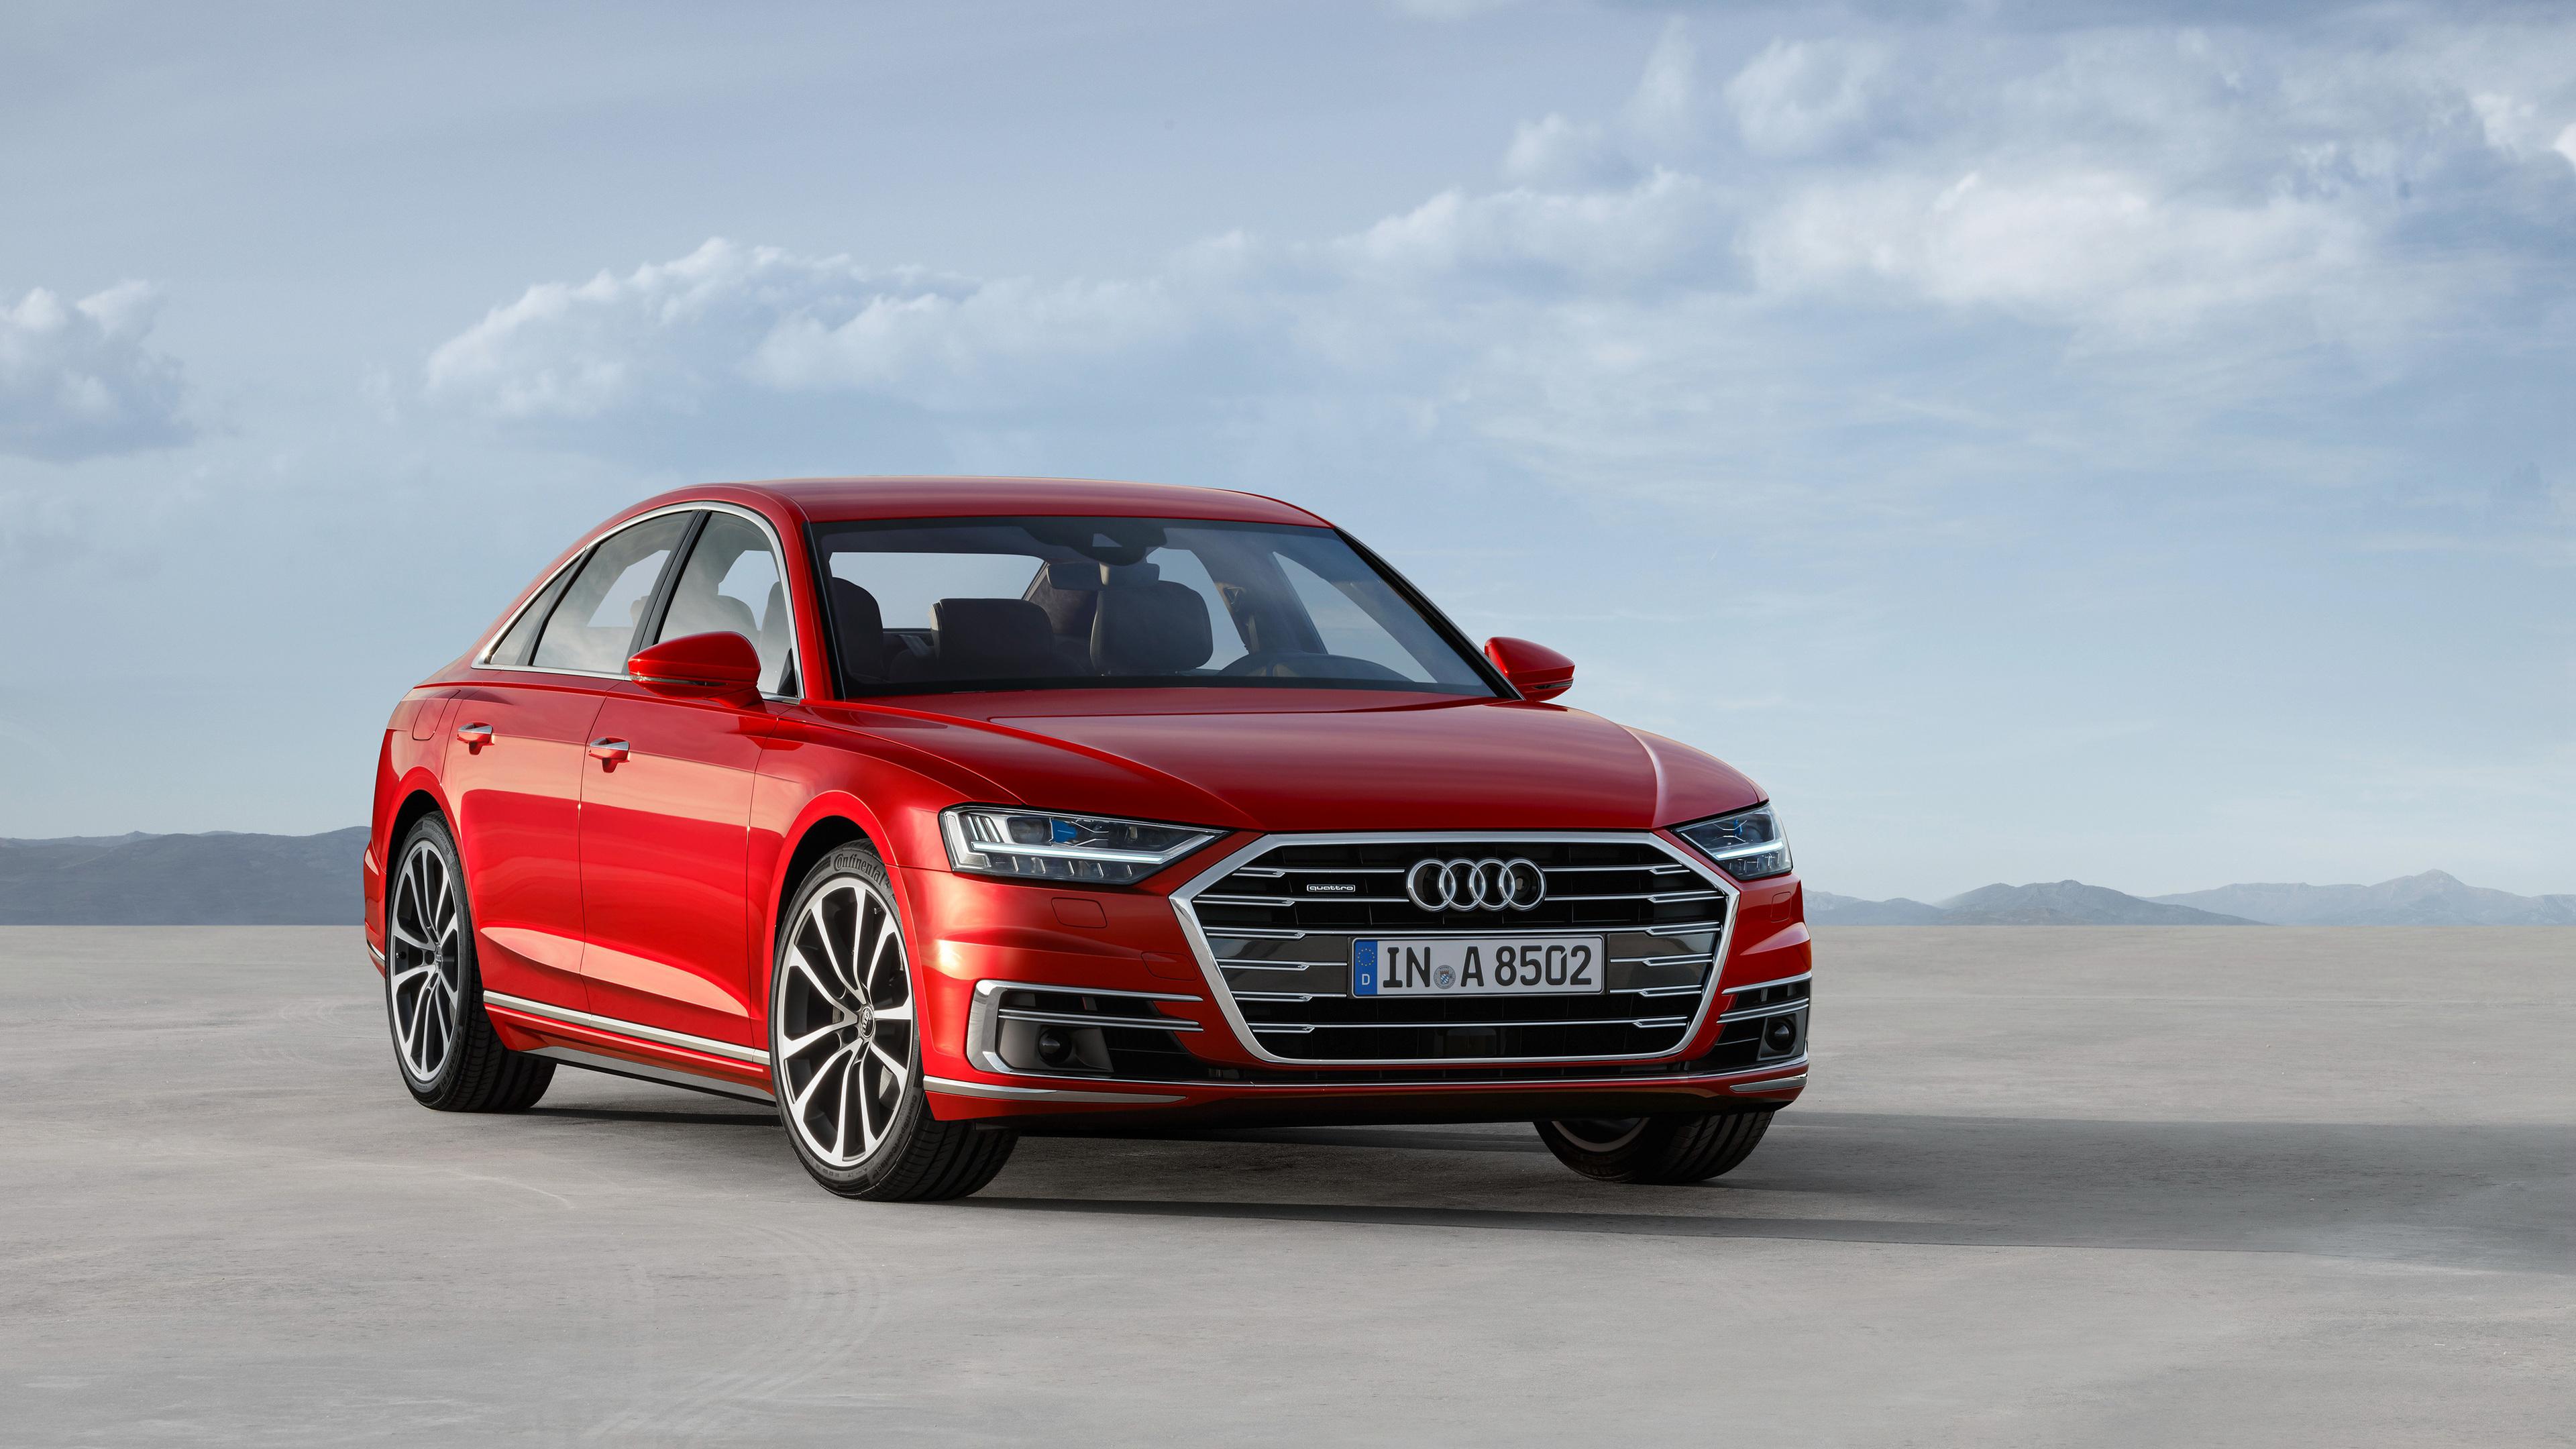 2018 audi a8 1539105883 - 2018 Audi A8 - hd-wallpapers, audi wallpapers, audi a8 wallpapers, 4k-wallpapers, 2018 cars wallpapers